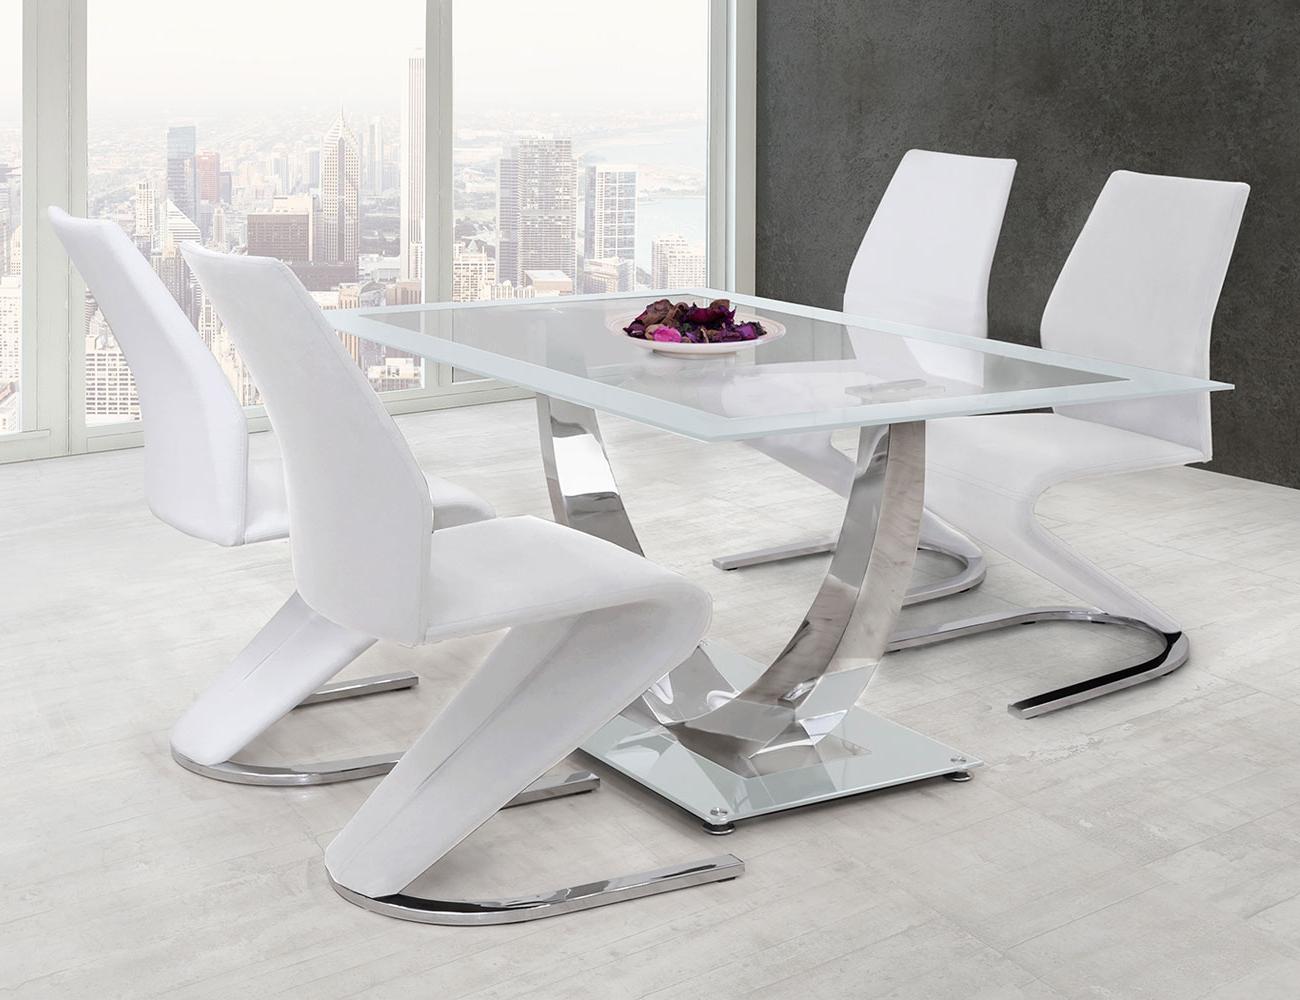 Mesas De Comedor De Cristal Ffdn Mesa De Edor De Cristal Templado Decorativa En Blanco